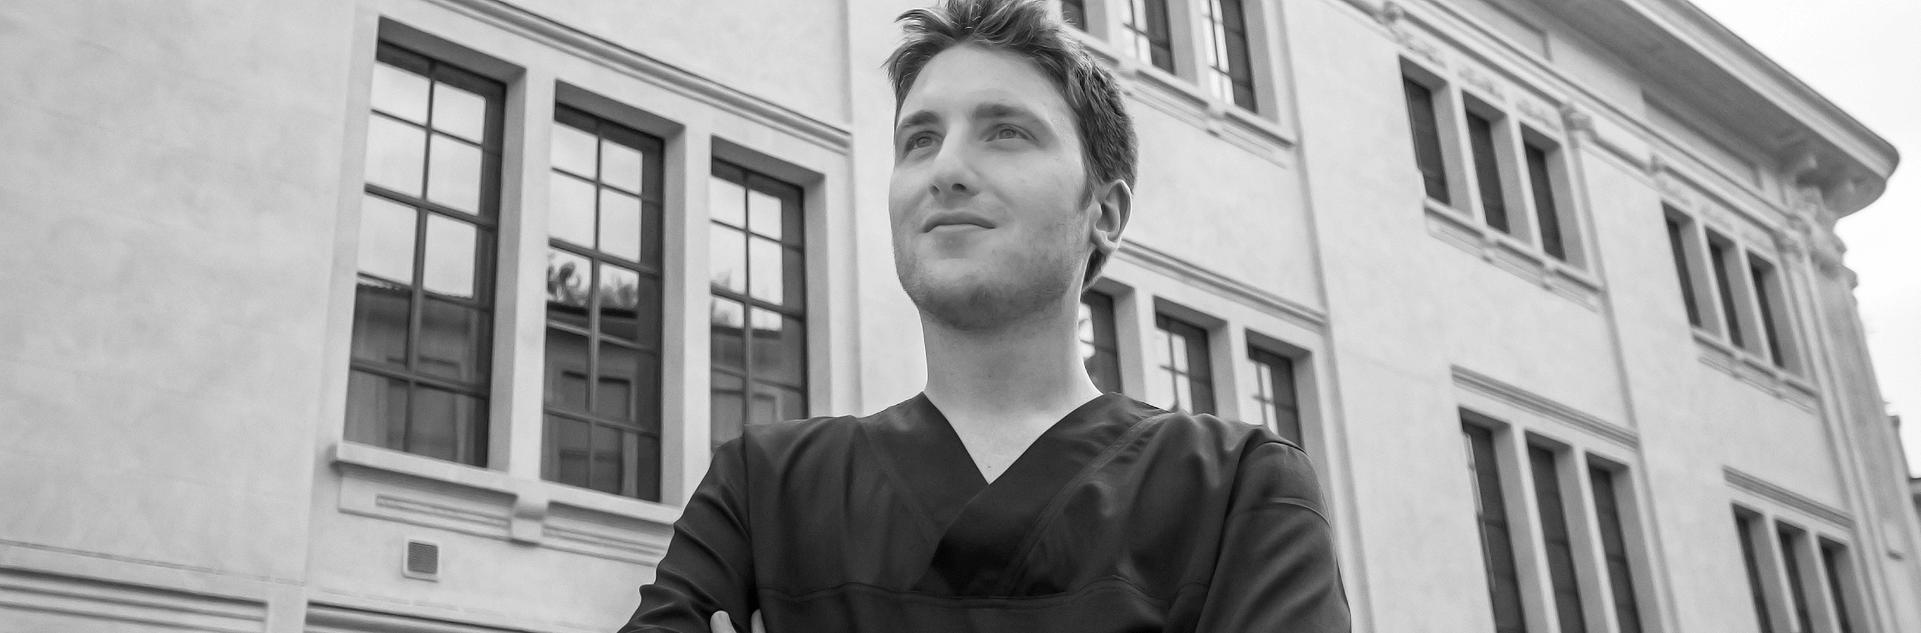 Dott. Doria medicina estetica Bergamo